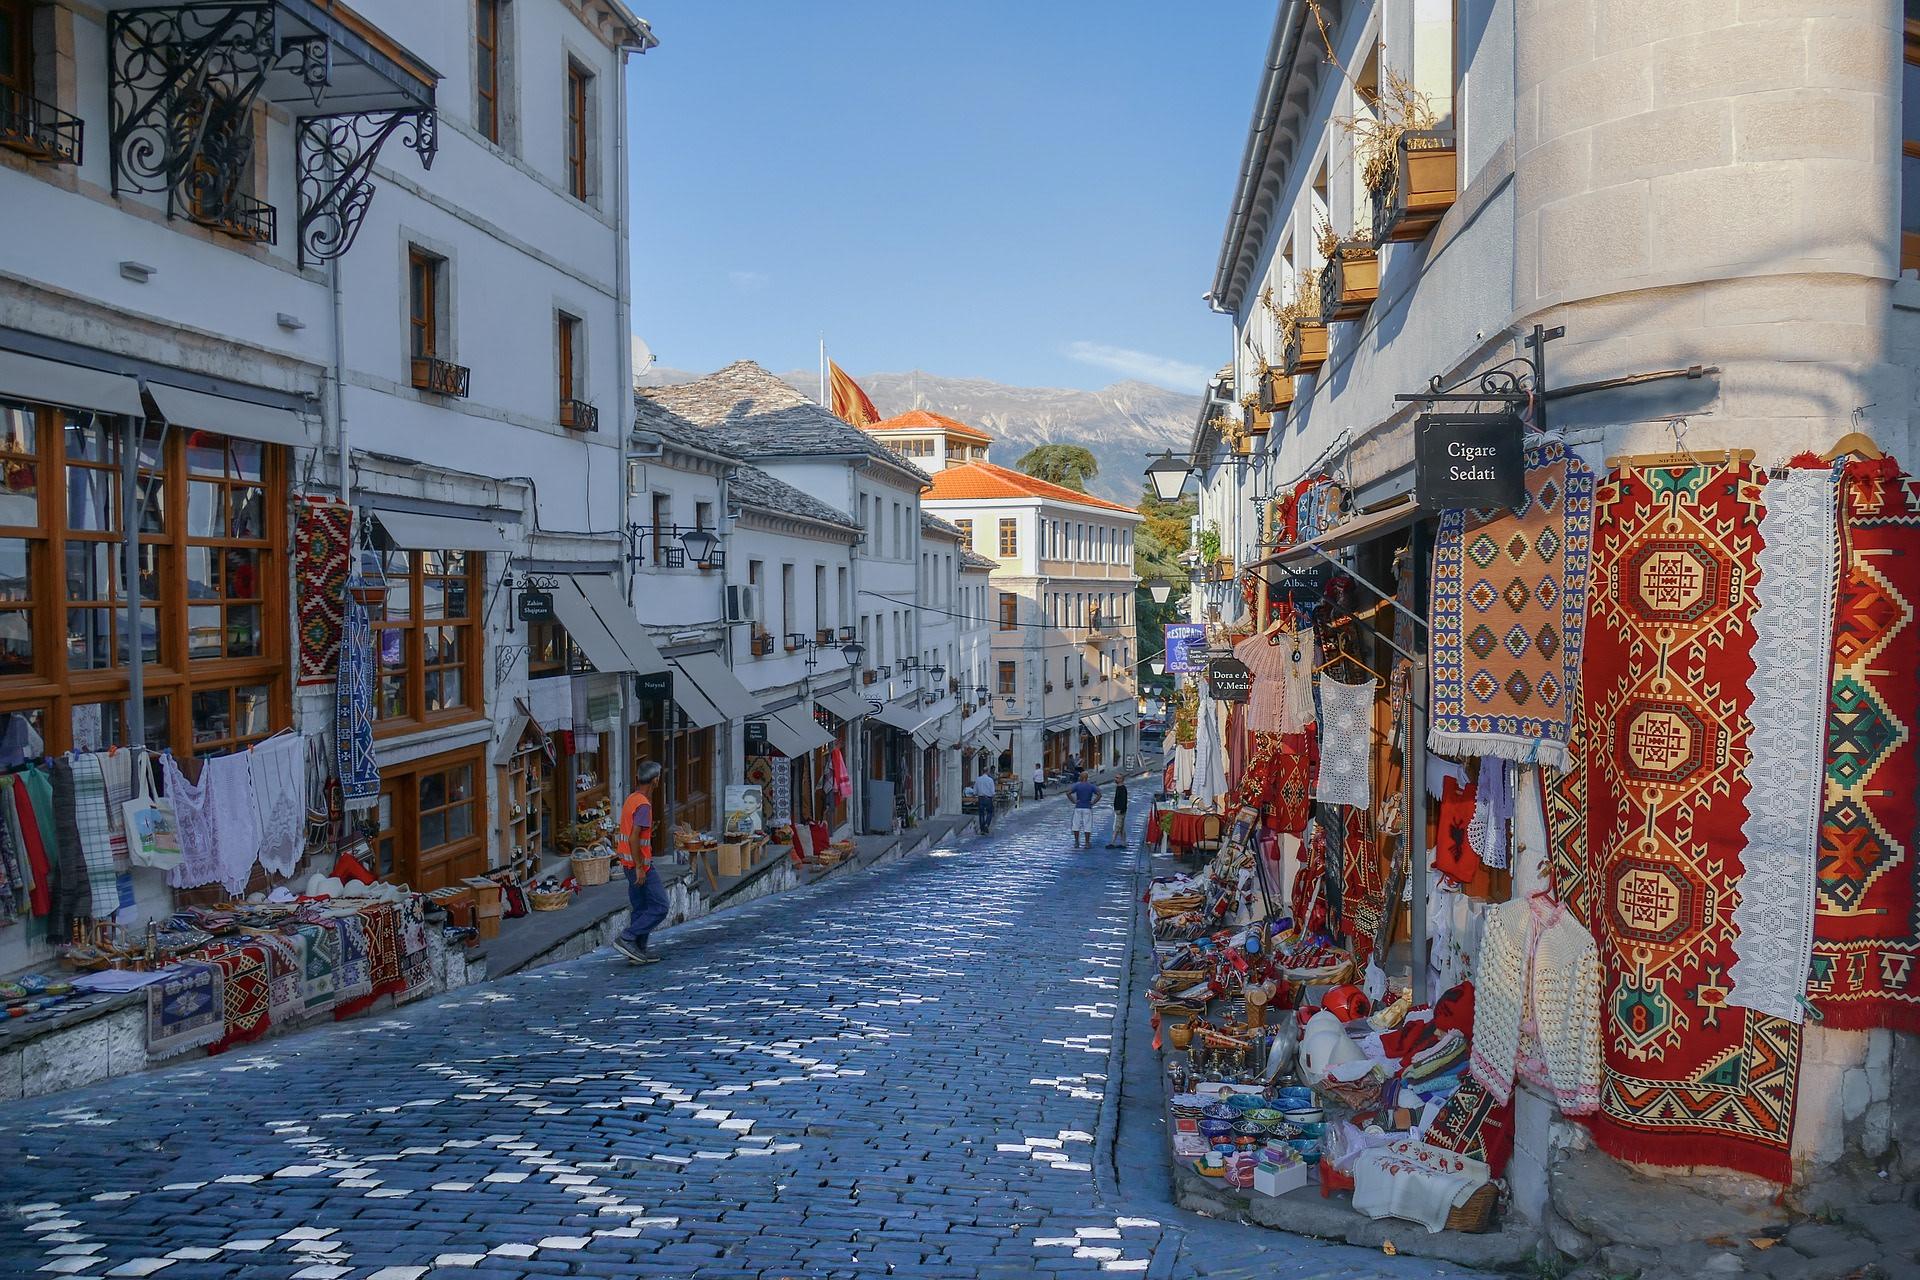 Stroll through the streets of Gjirokaster